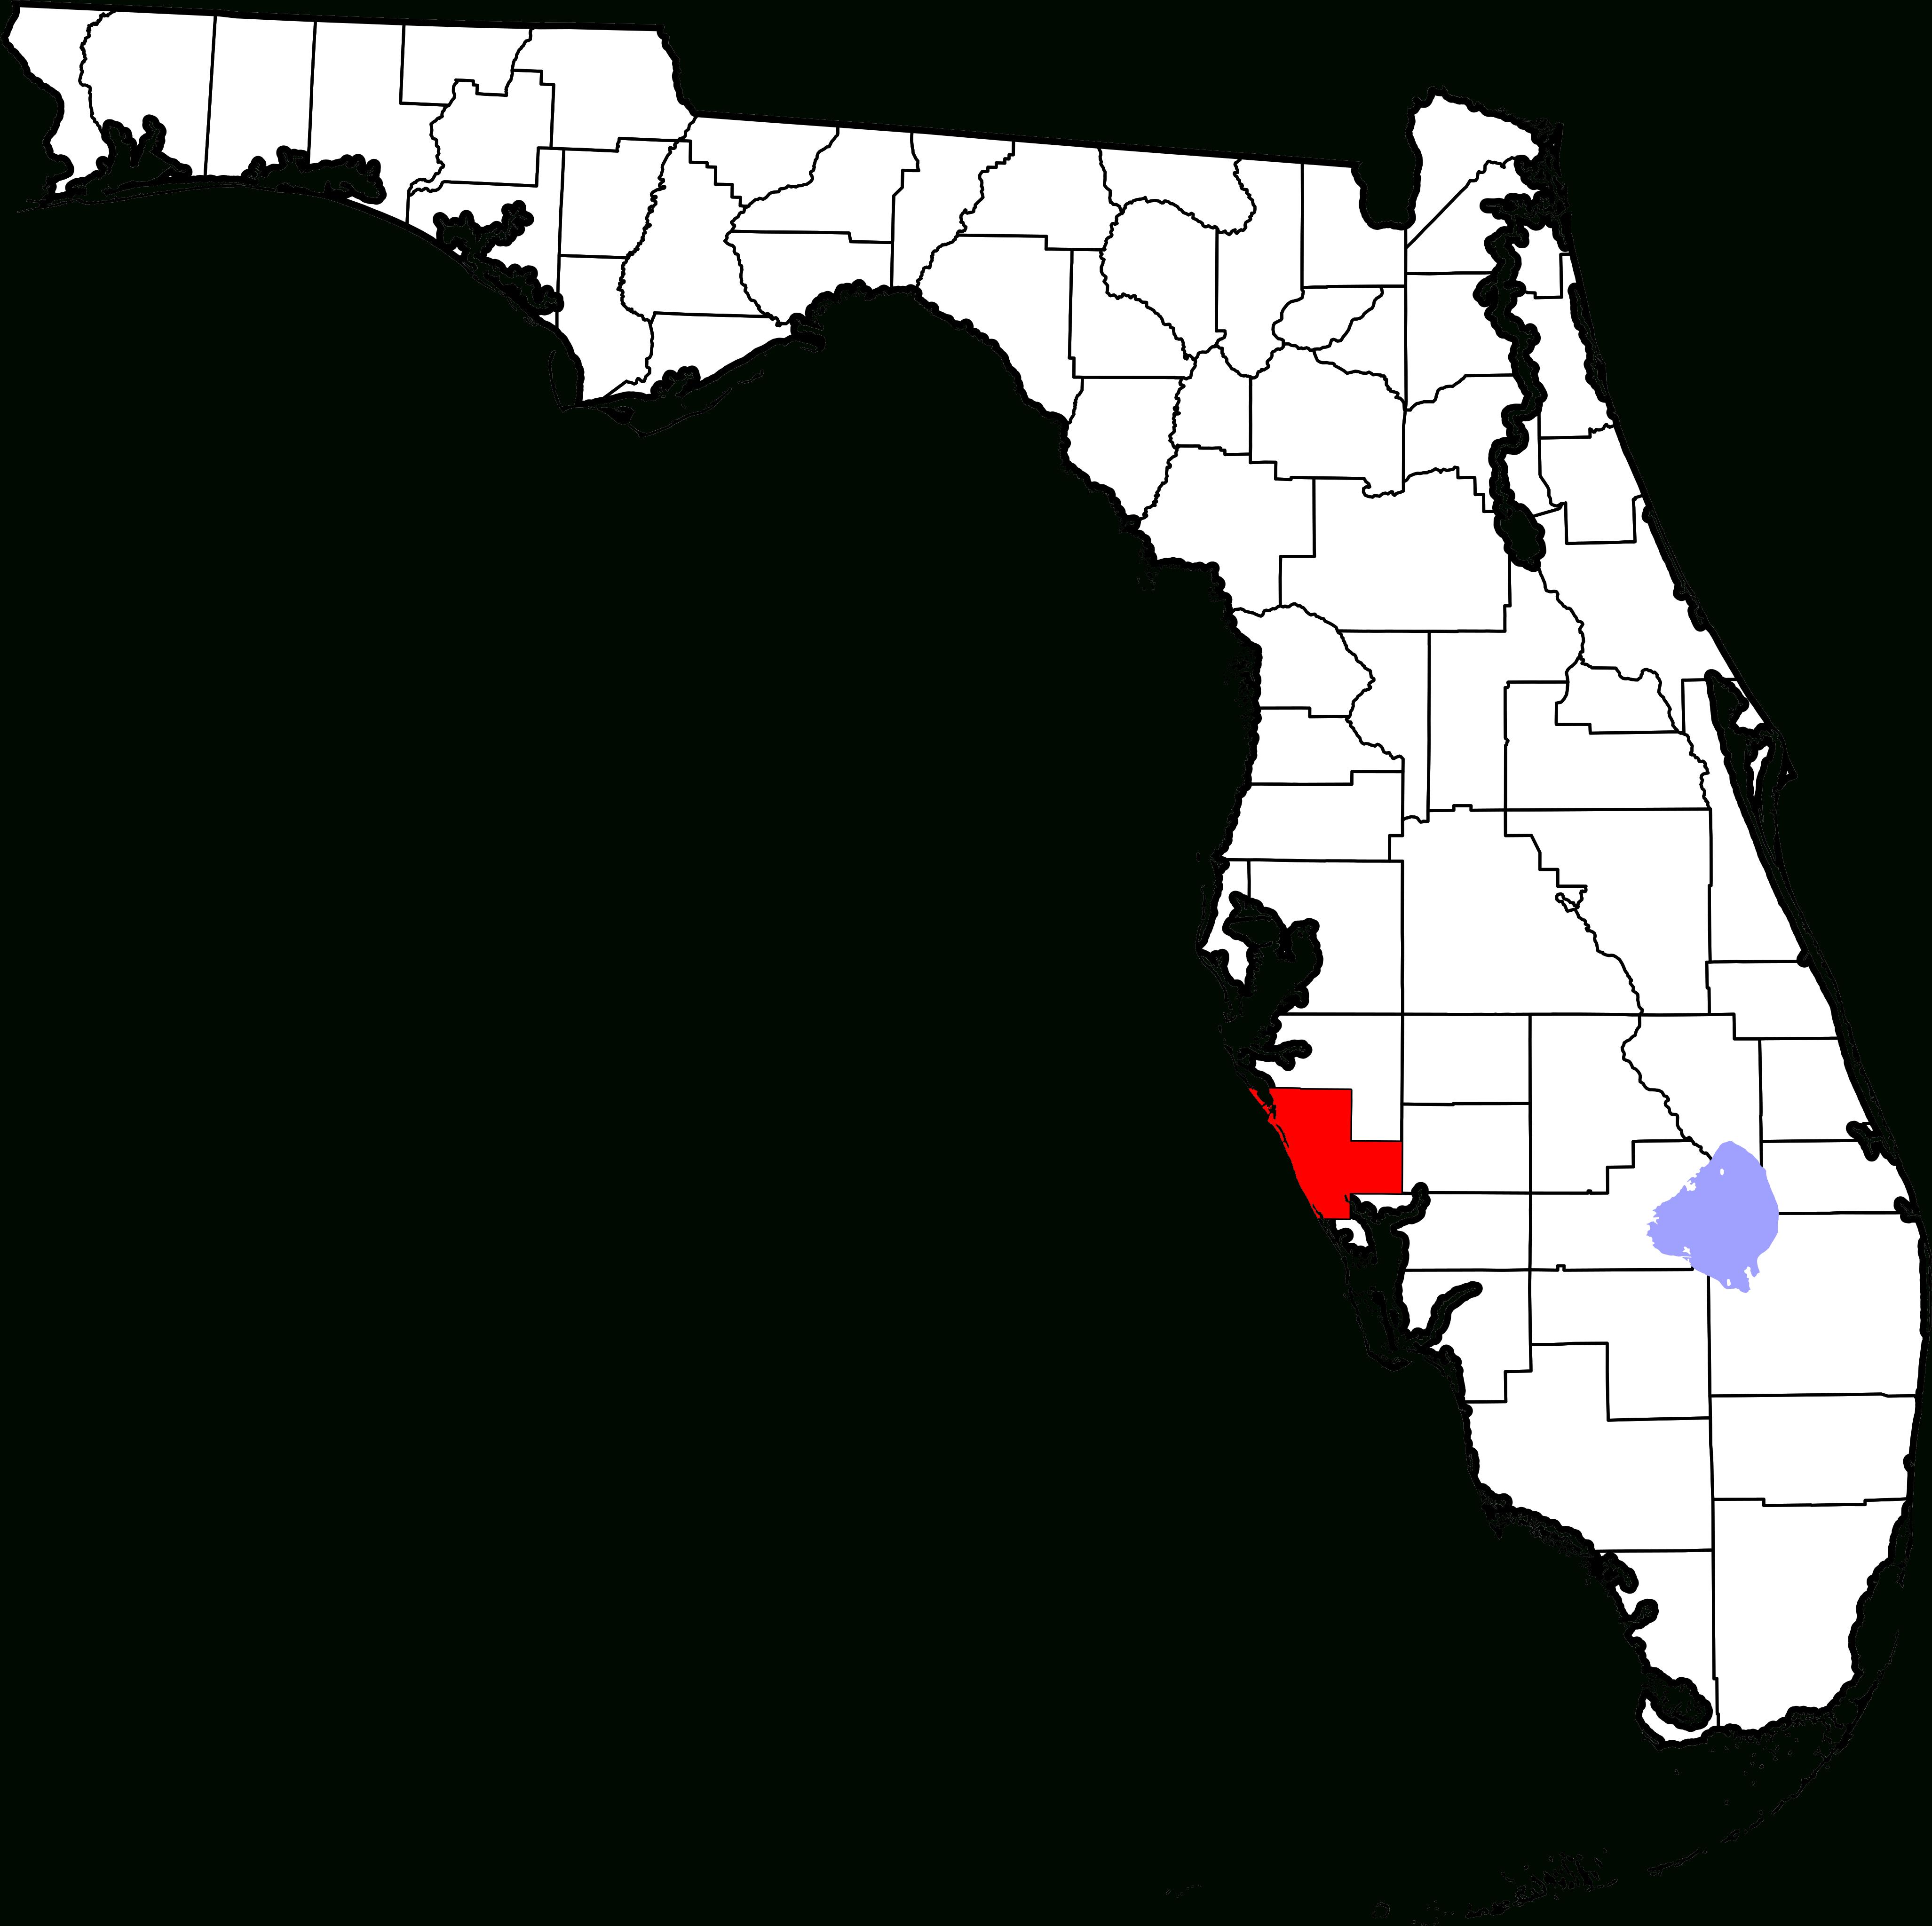 File:map Of Florida Highlighting Sarasota County.svg - Wikipedia - Osprey Florida Map